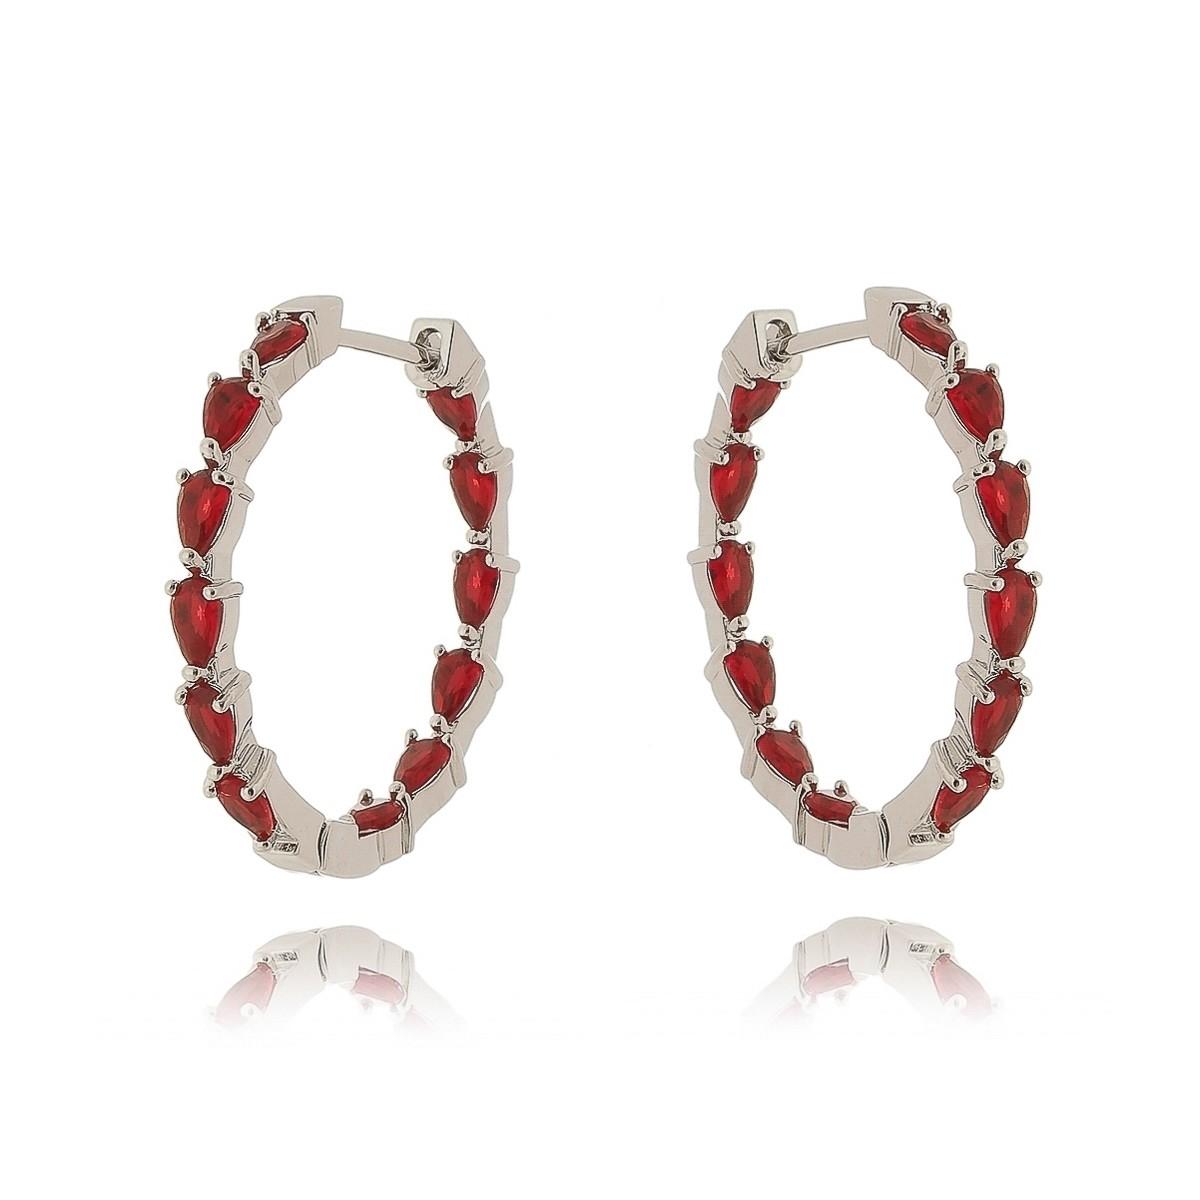 Argola Vermelha Rubi Semijoia Fashion em Ródio Branco  - Soloyou